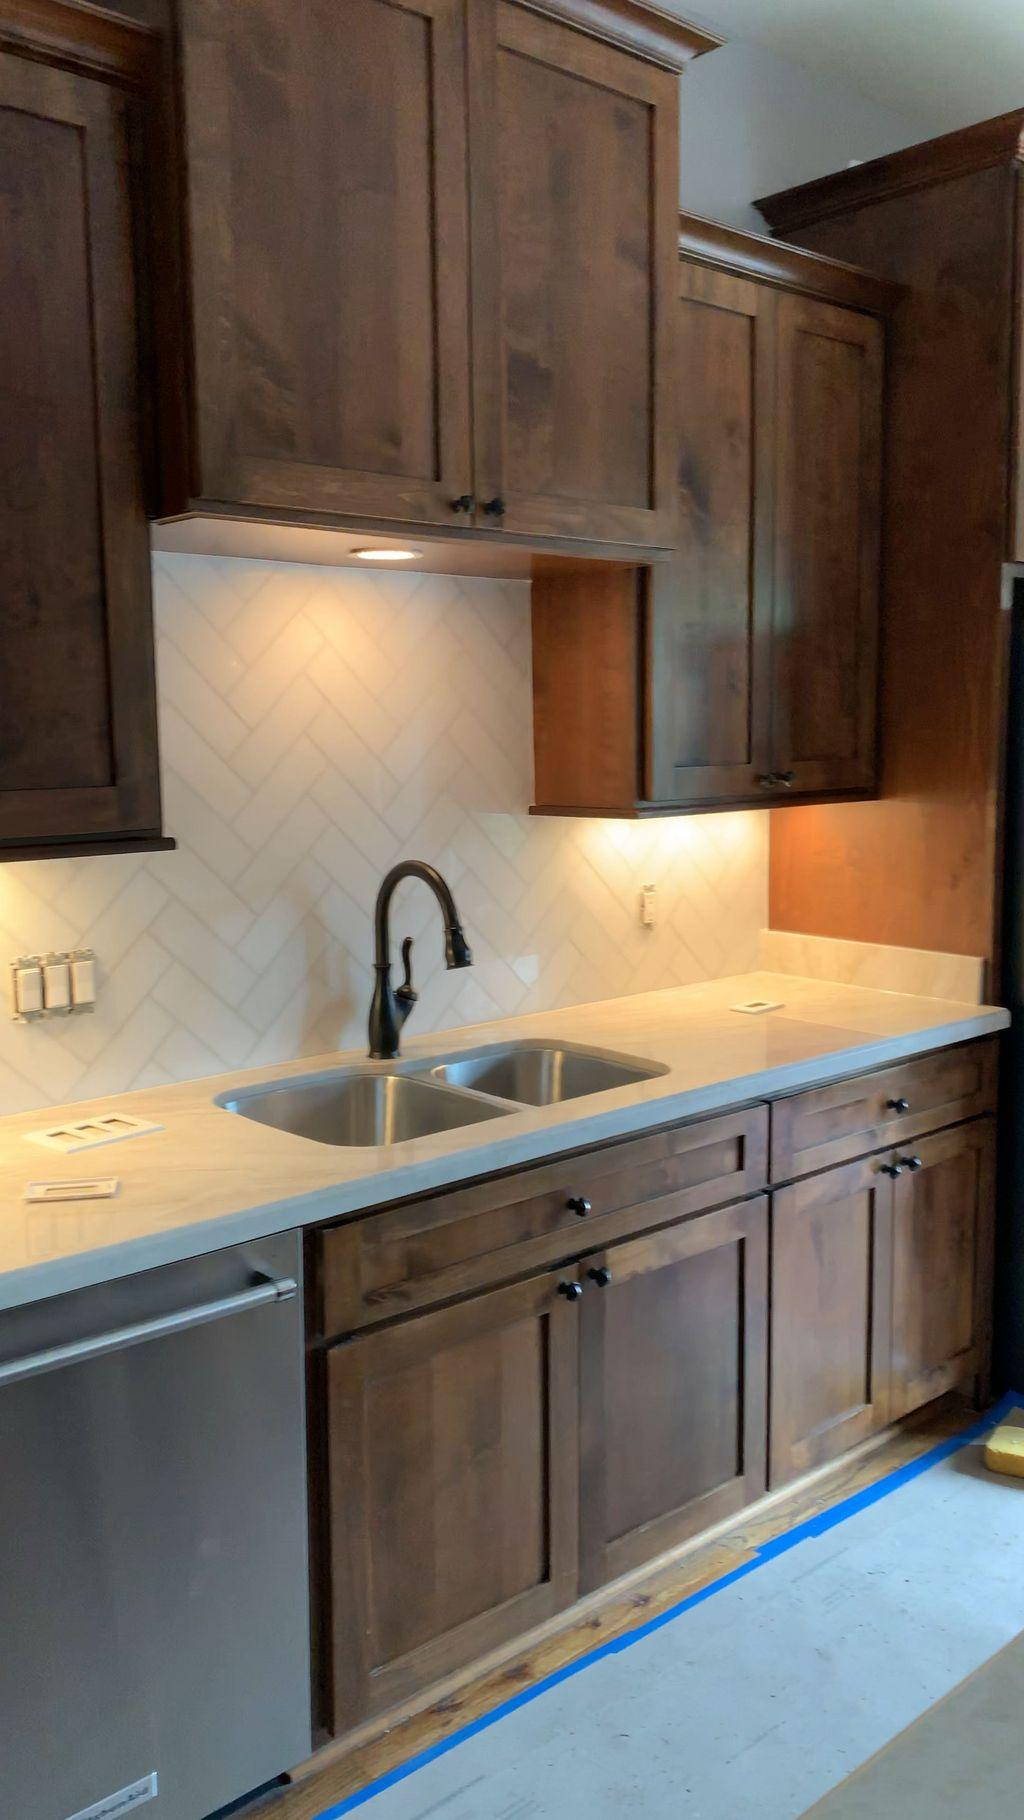 Nice Rustic Farmhouse Kitchen Cabinets Design Ideas 32 ... on Rustic:yucvisfte_S= Farmhouse Kitchen Ideas  id=32835